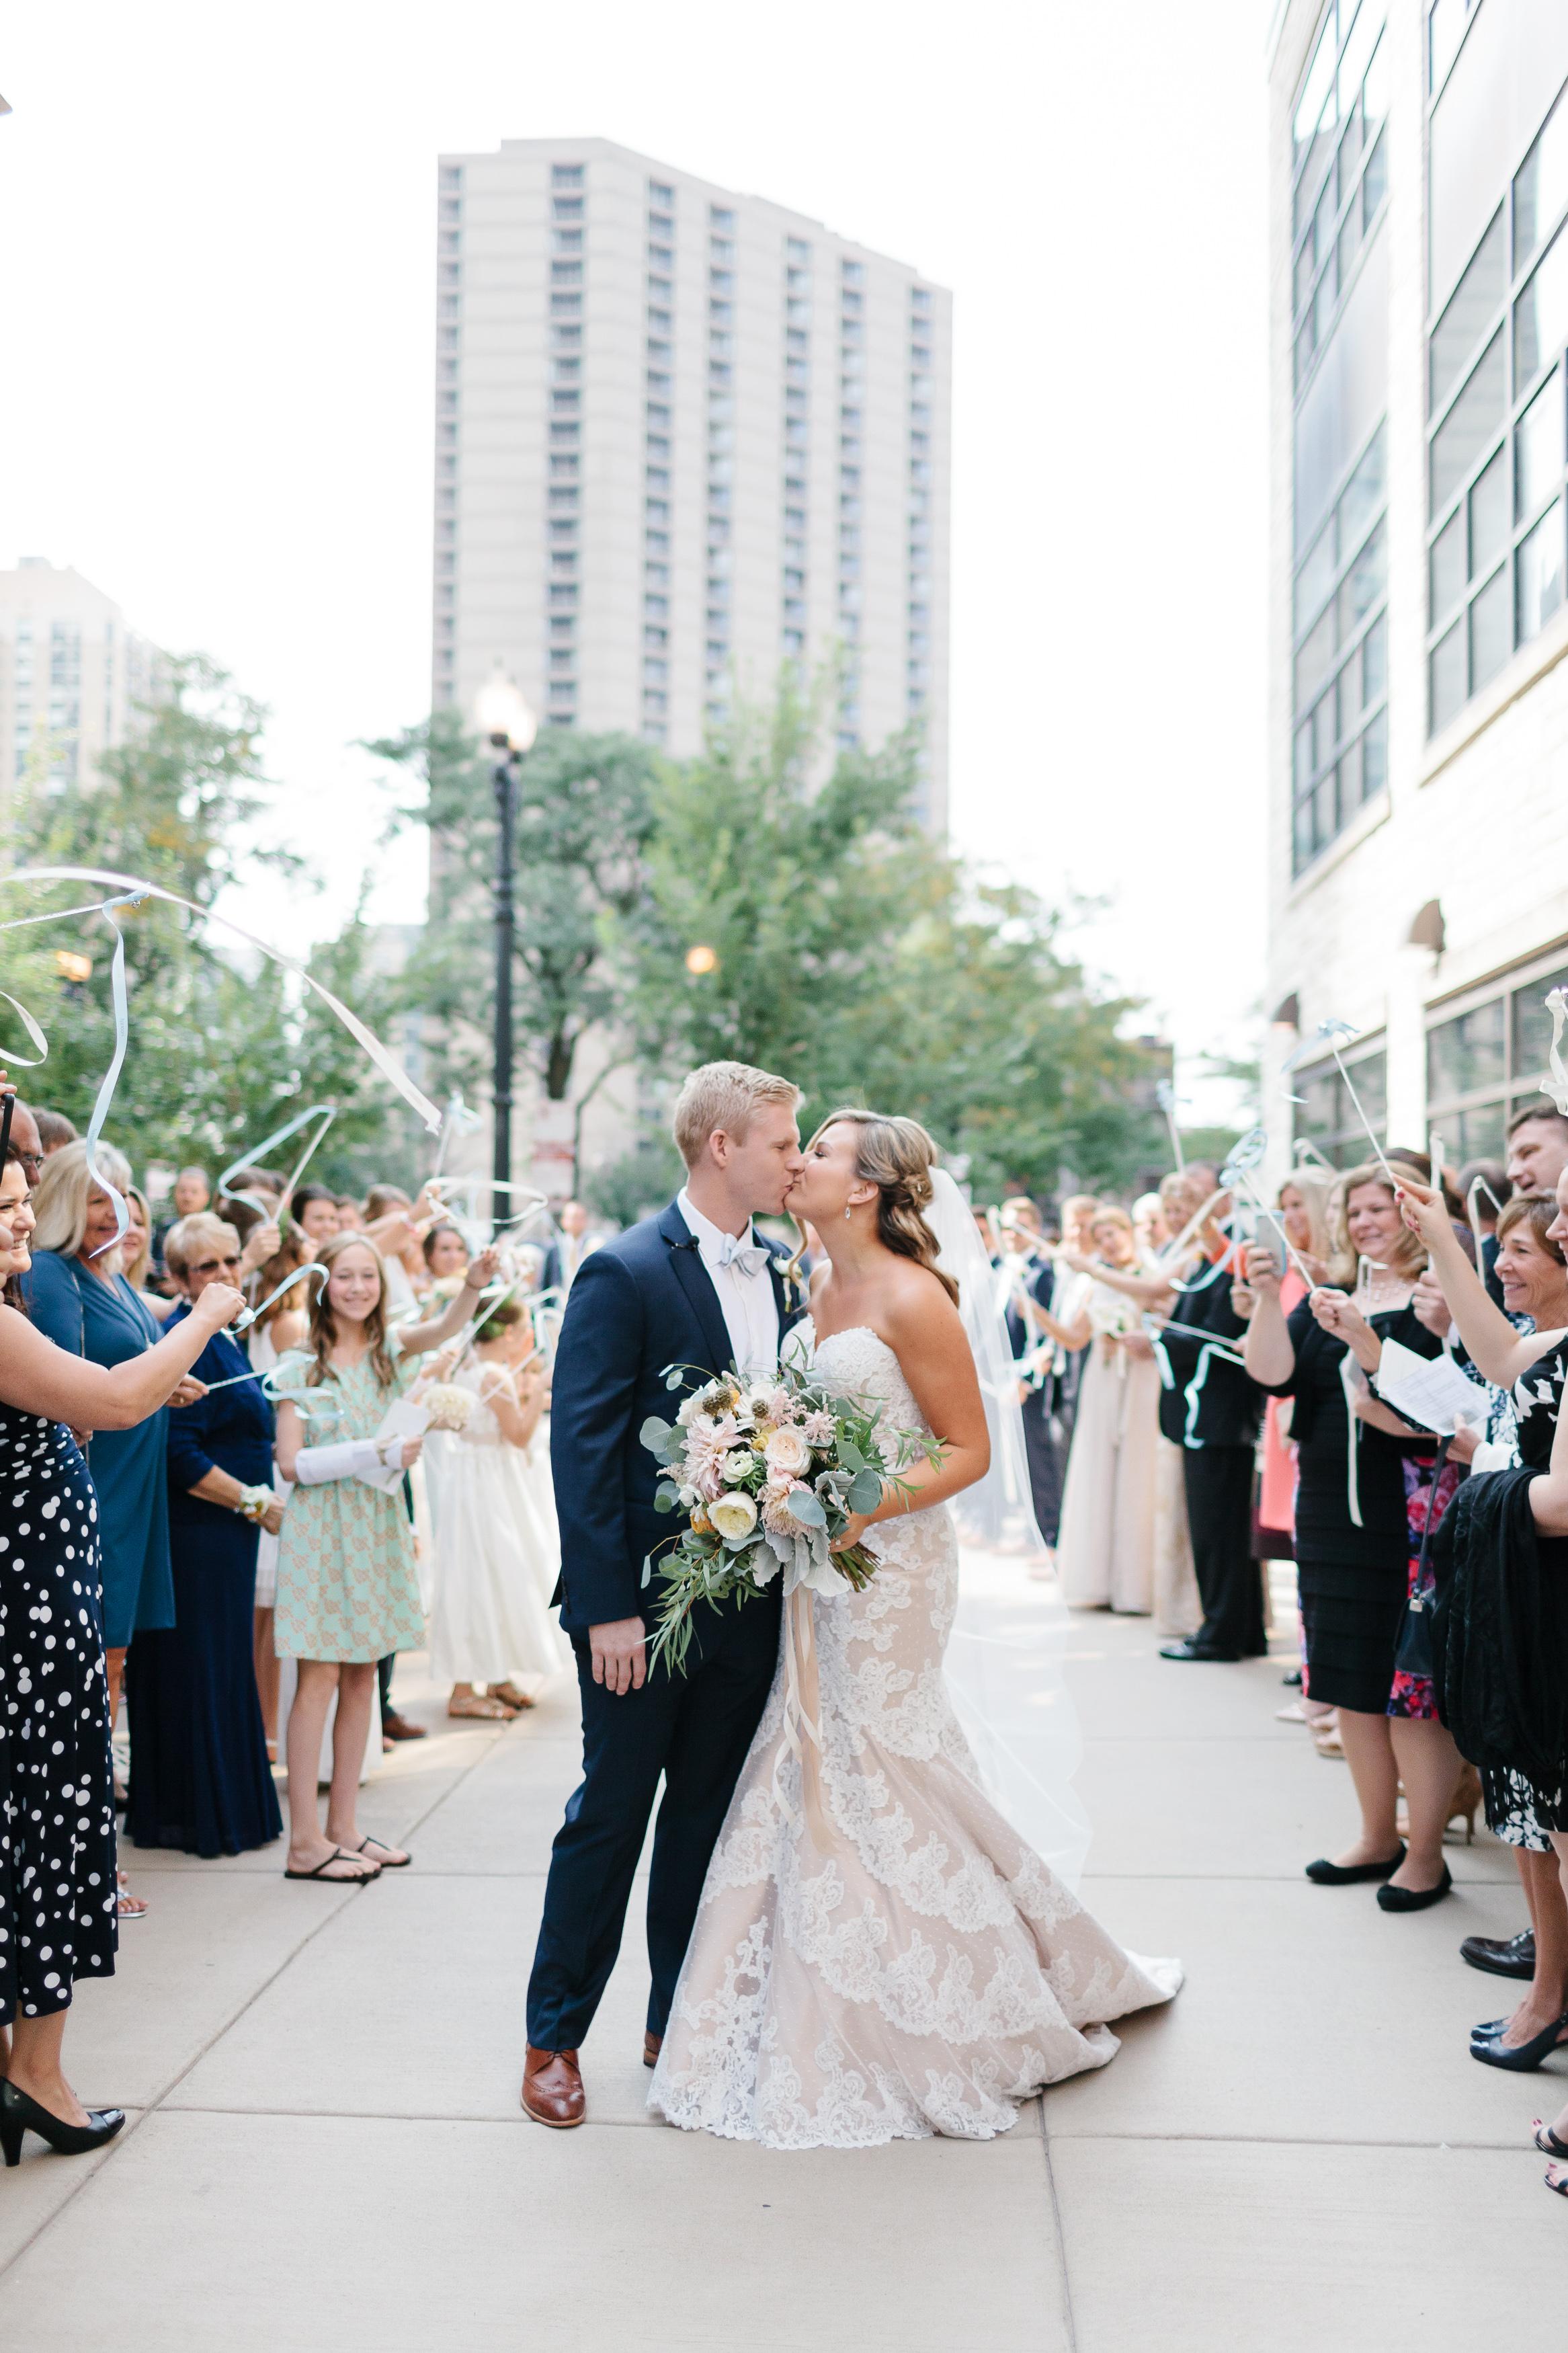 Nicodem Creative-McHugh Wedding-Artifact Events Chicago-10.jpg